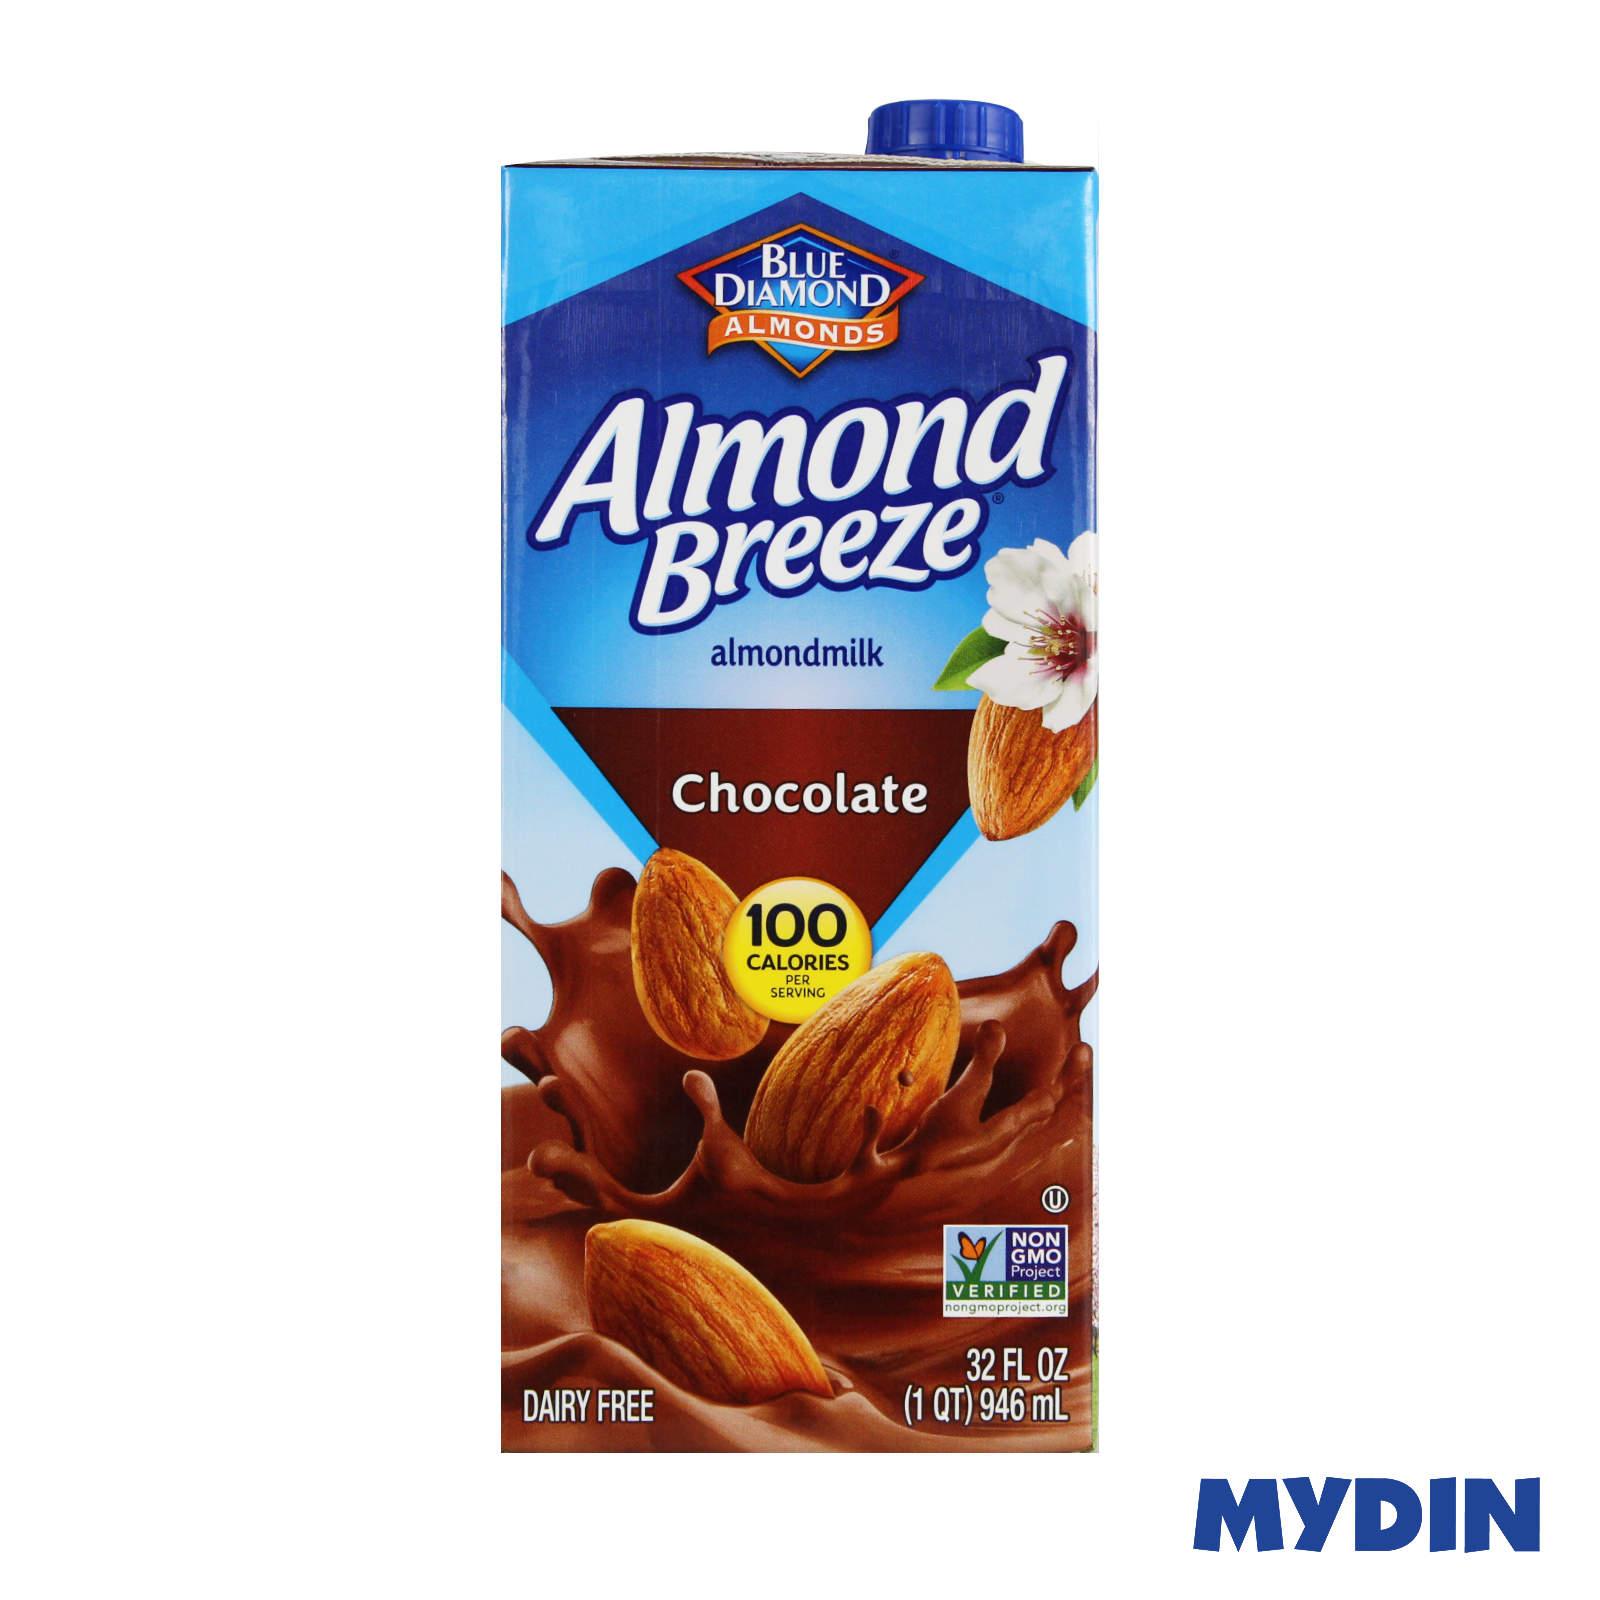 Blue Diamond Almond Breeze Almondmilk (946ml) - 3 Variants